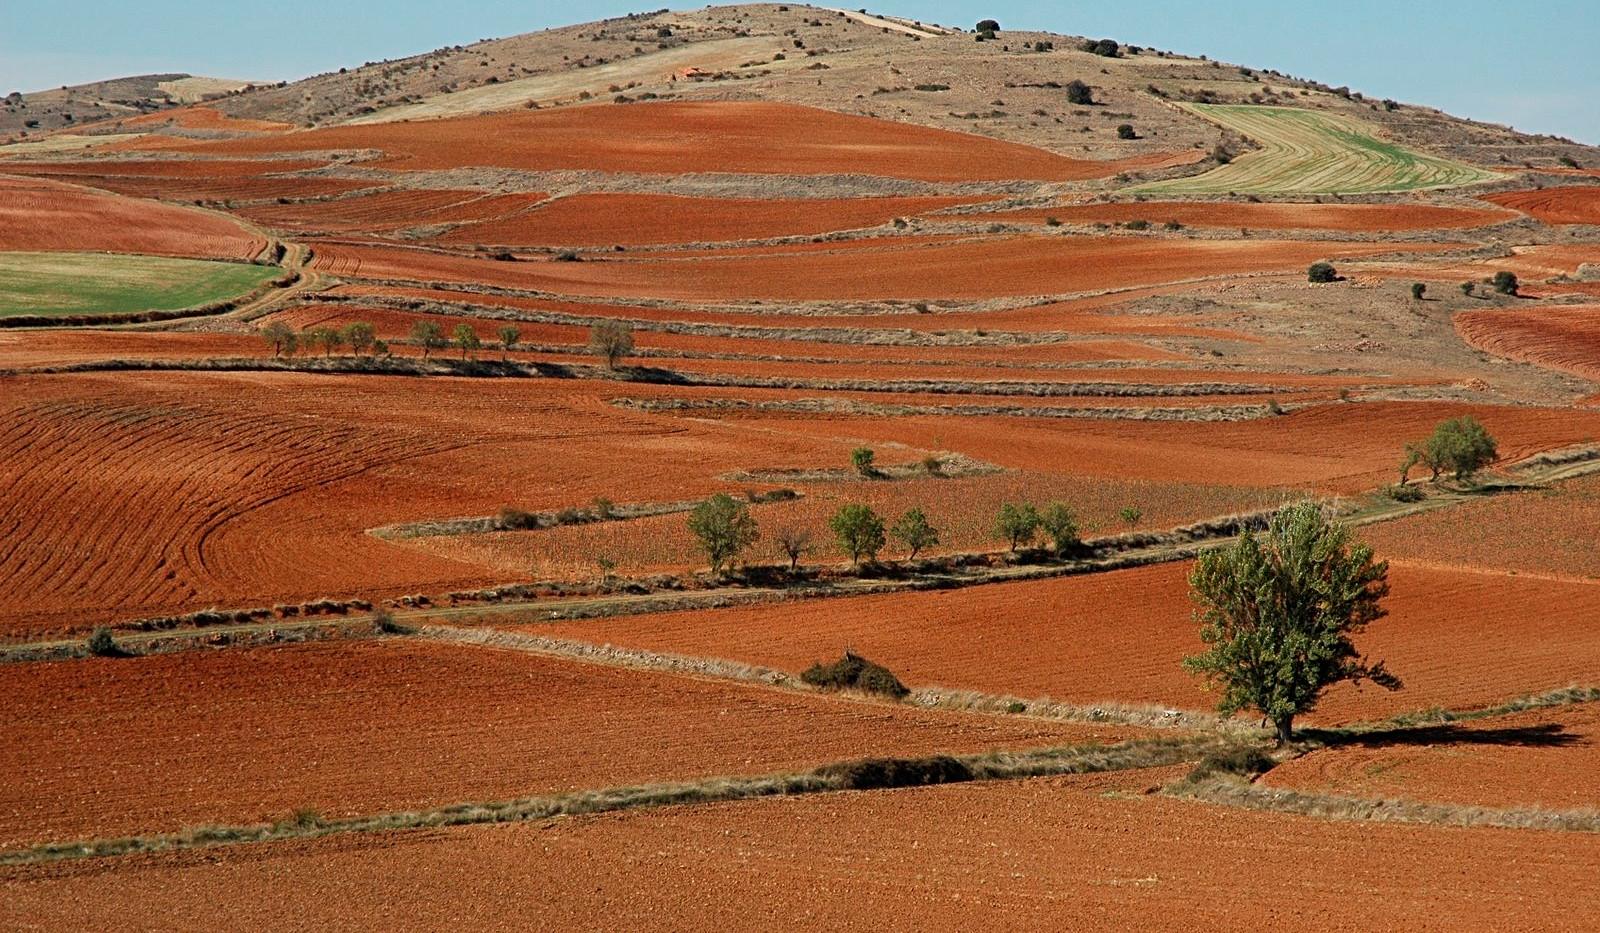 Campos labrados / Agricultural fields